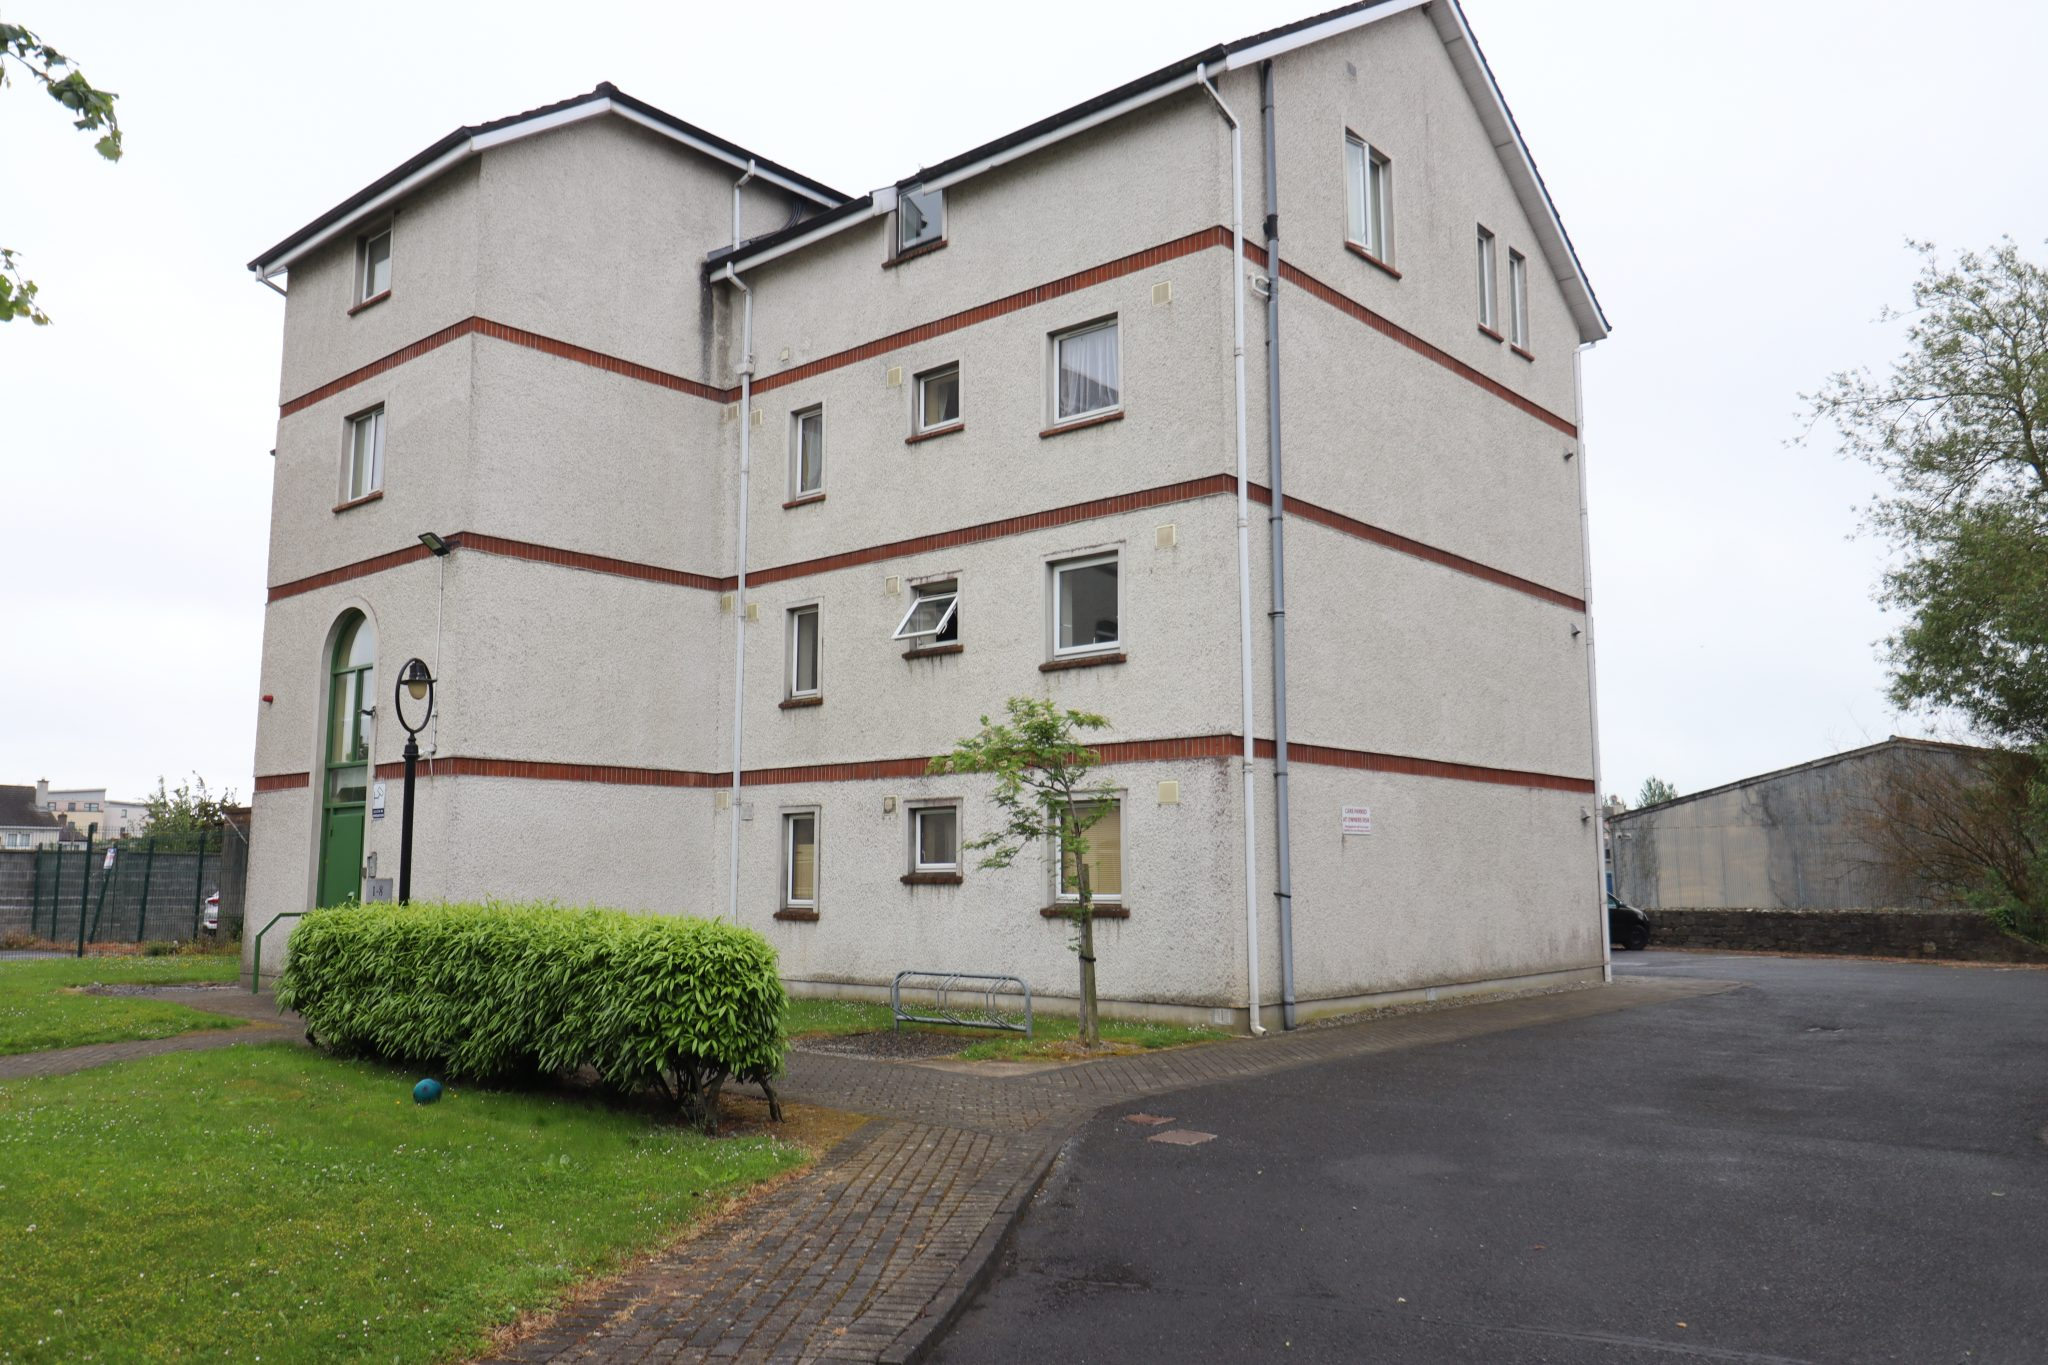 3 Millbrook, Mill Lane, Carlow Town, Co. Carlow